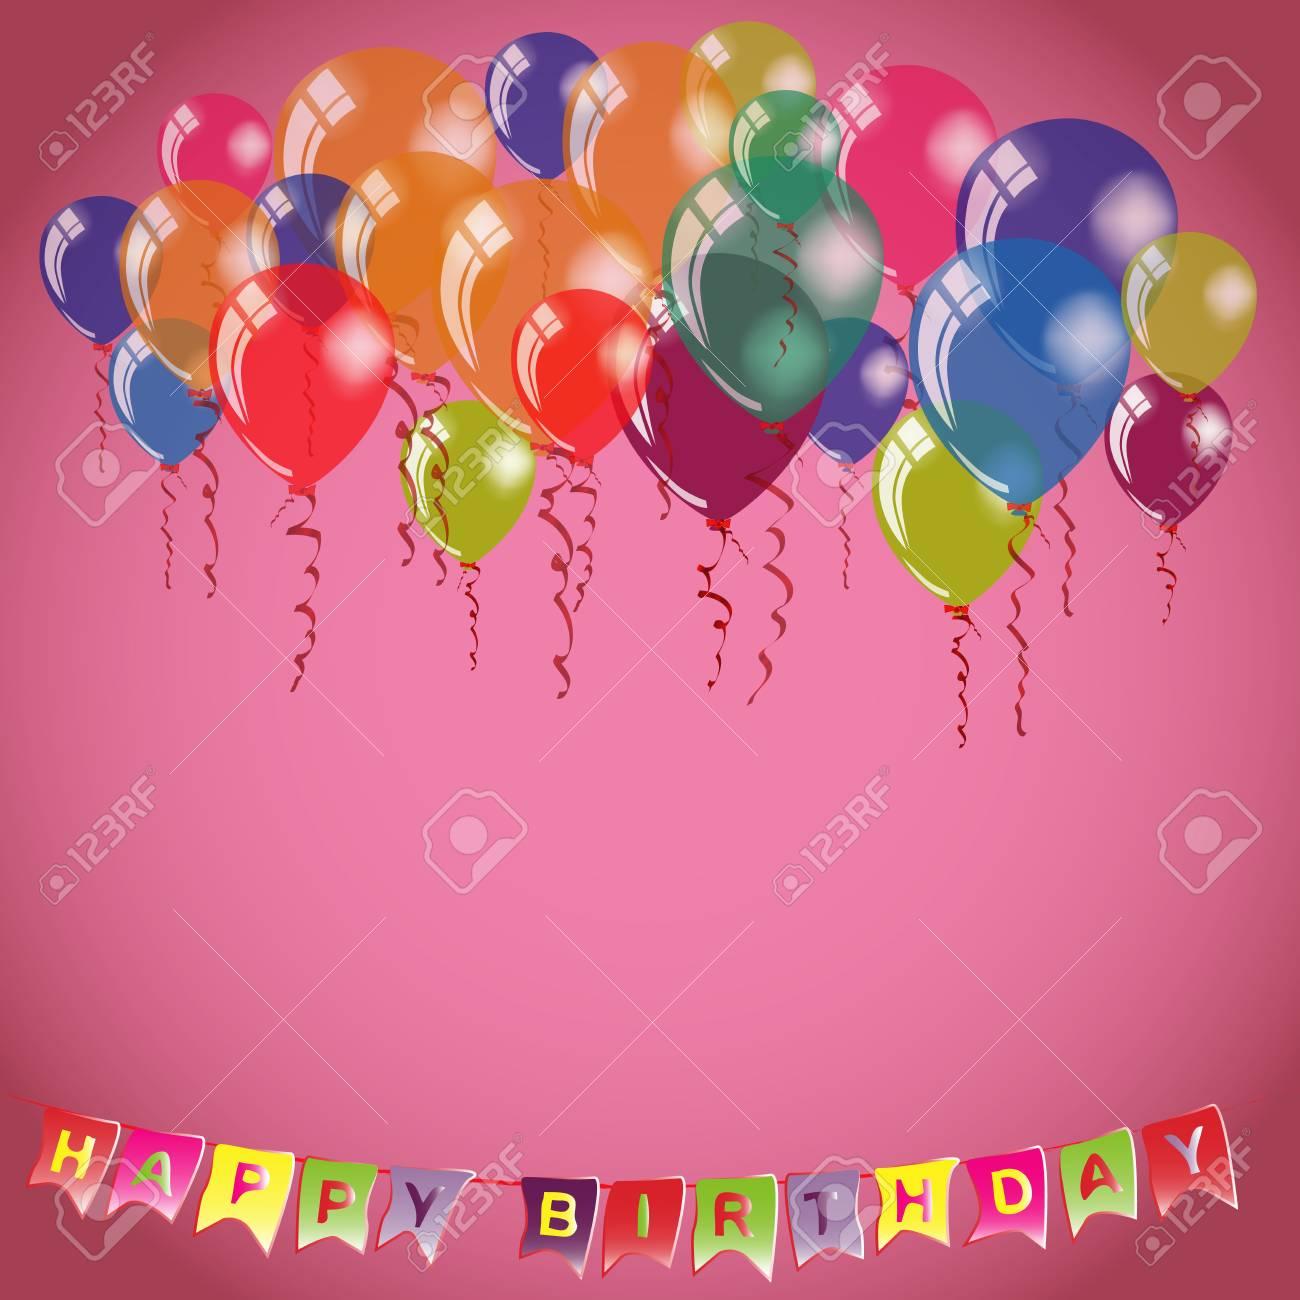 Happy birthday invitation or congratulation card template place happy birthday invitation or congratulation card template place for name and text on pink background stopboris Gallery